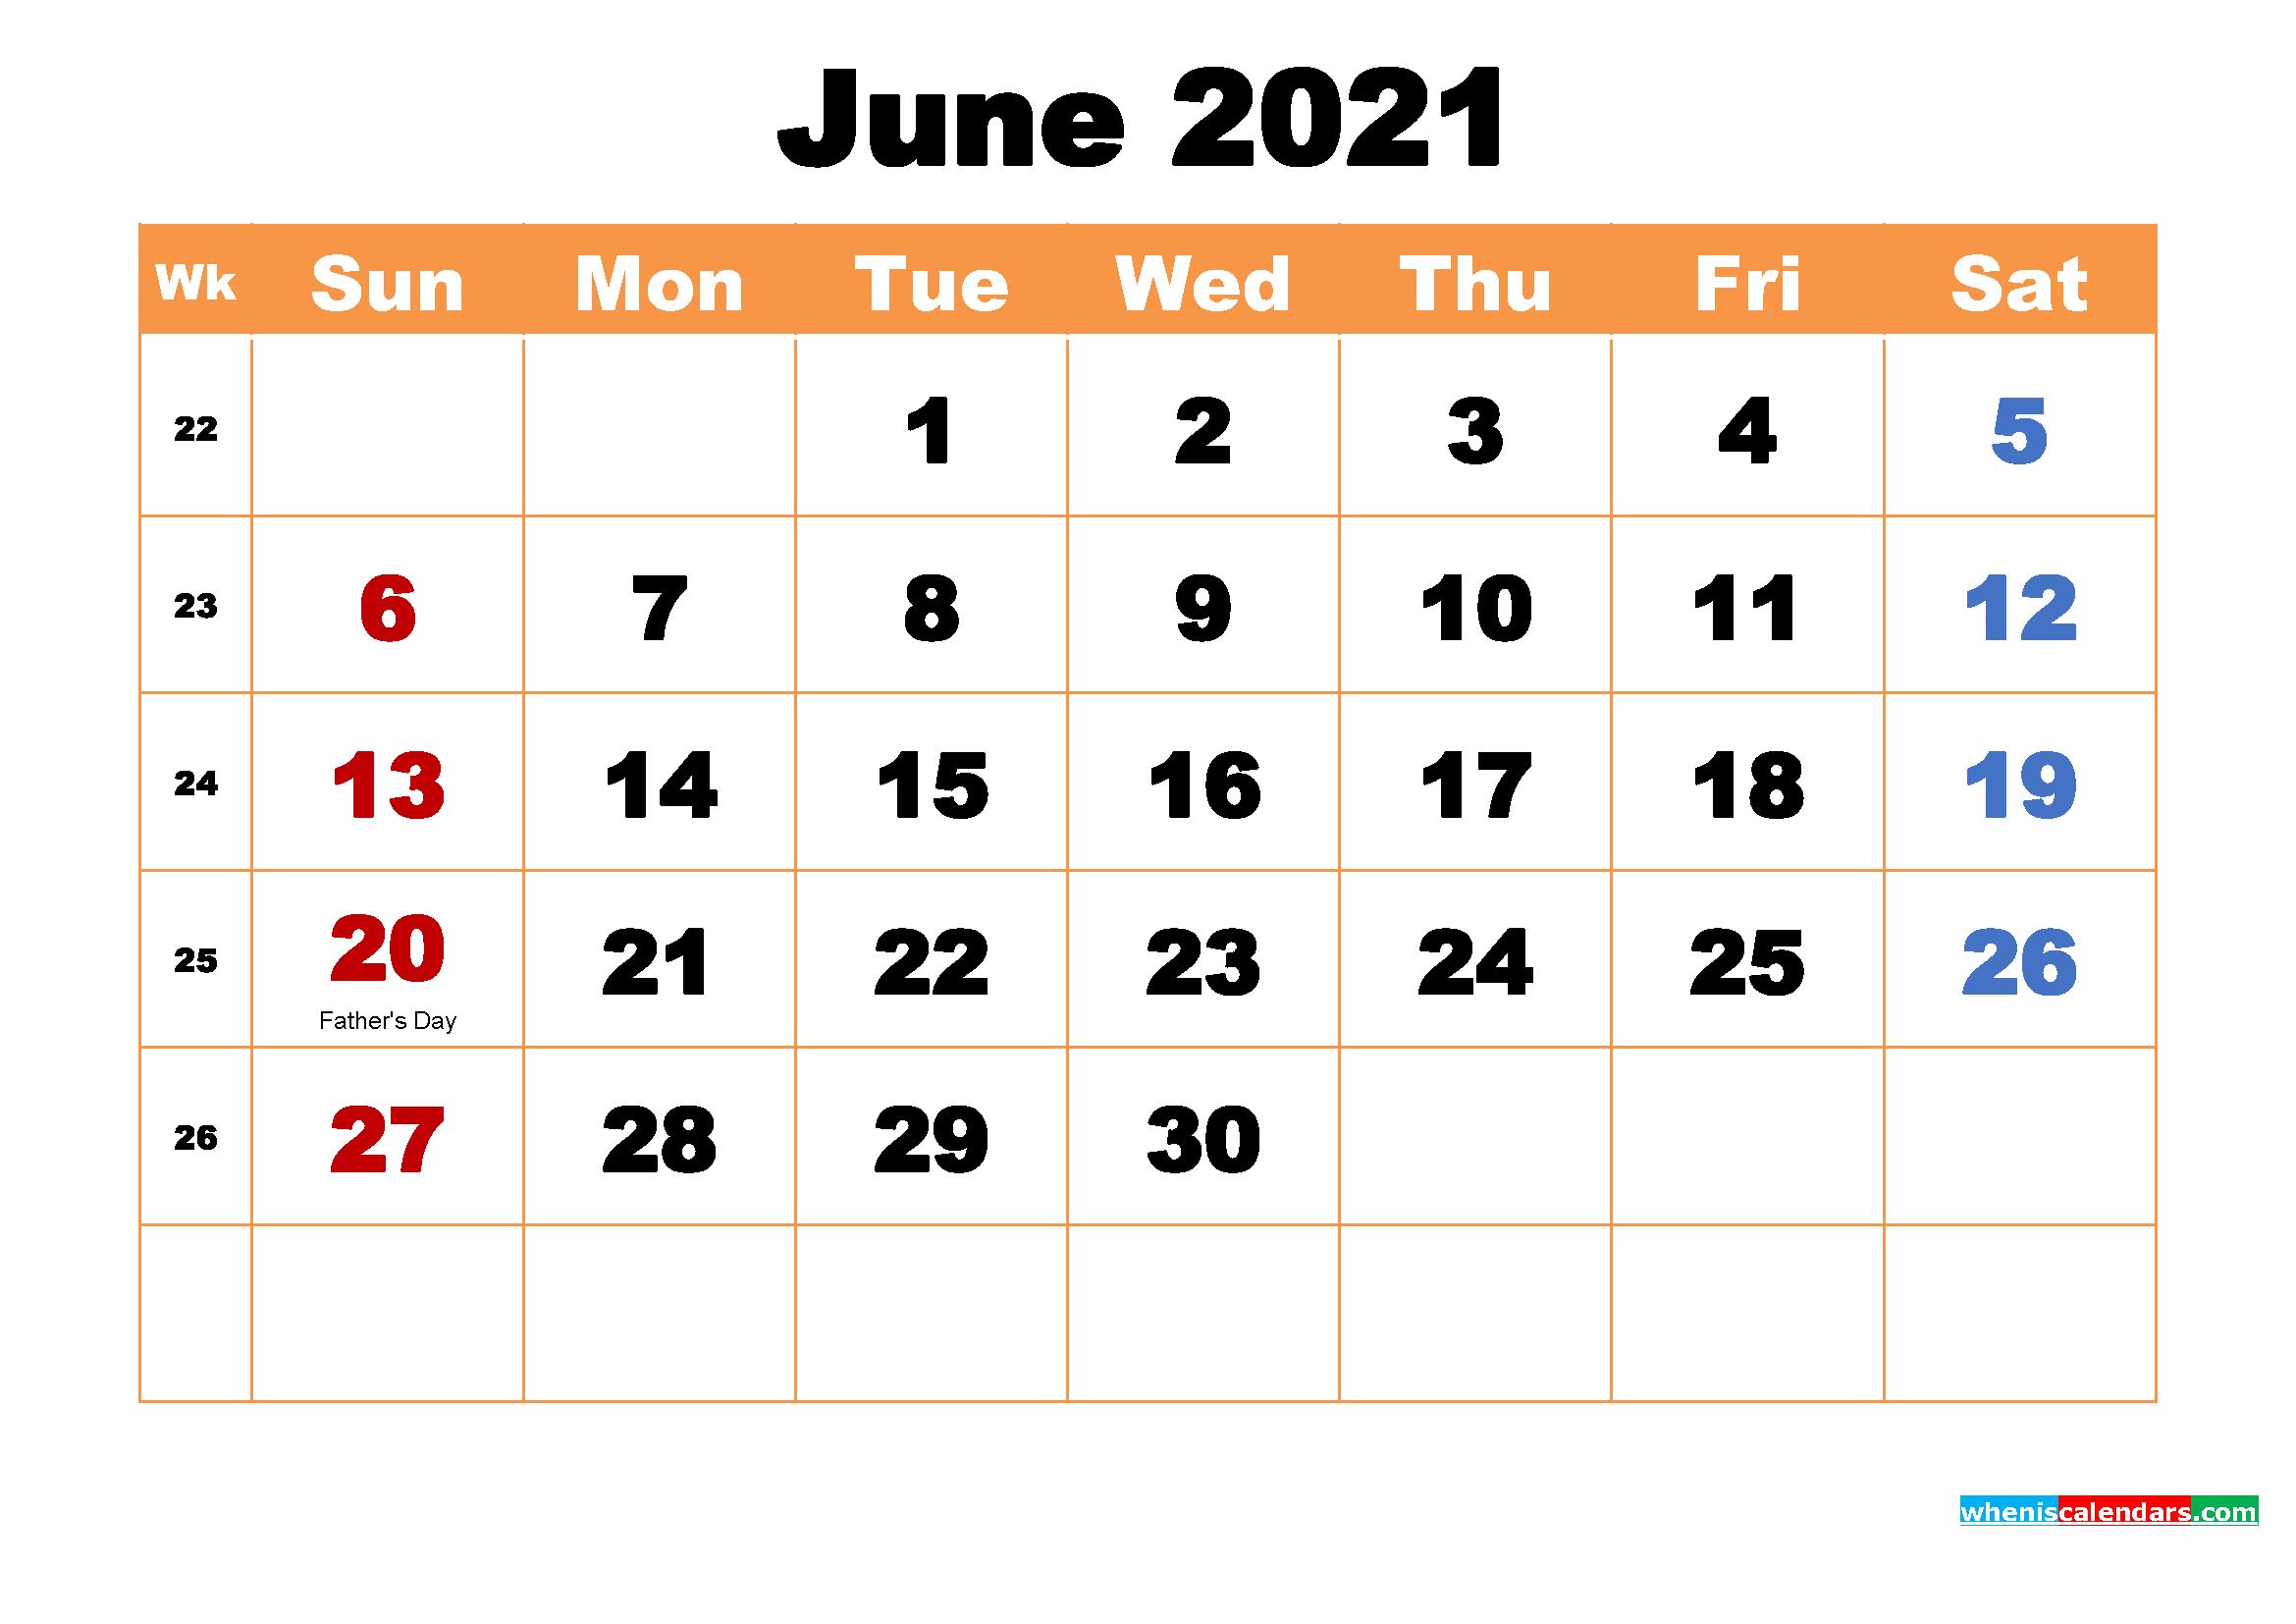 June 2021 Desktop Calendar Free Download